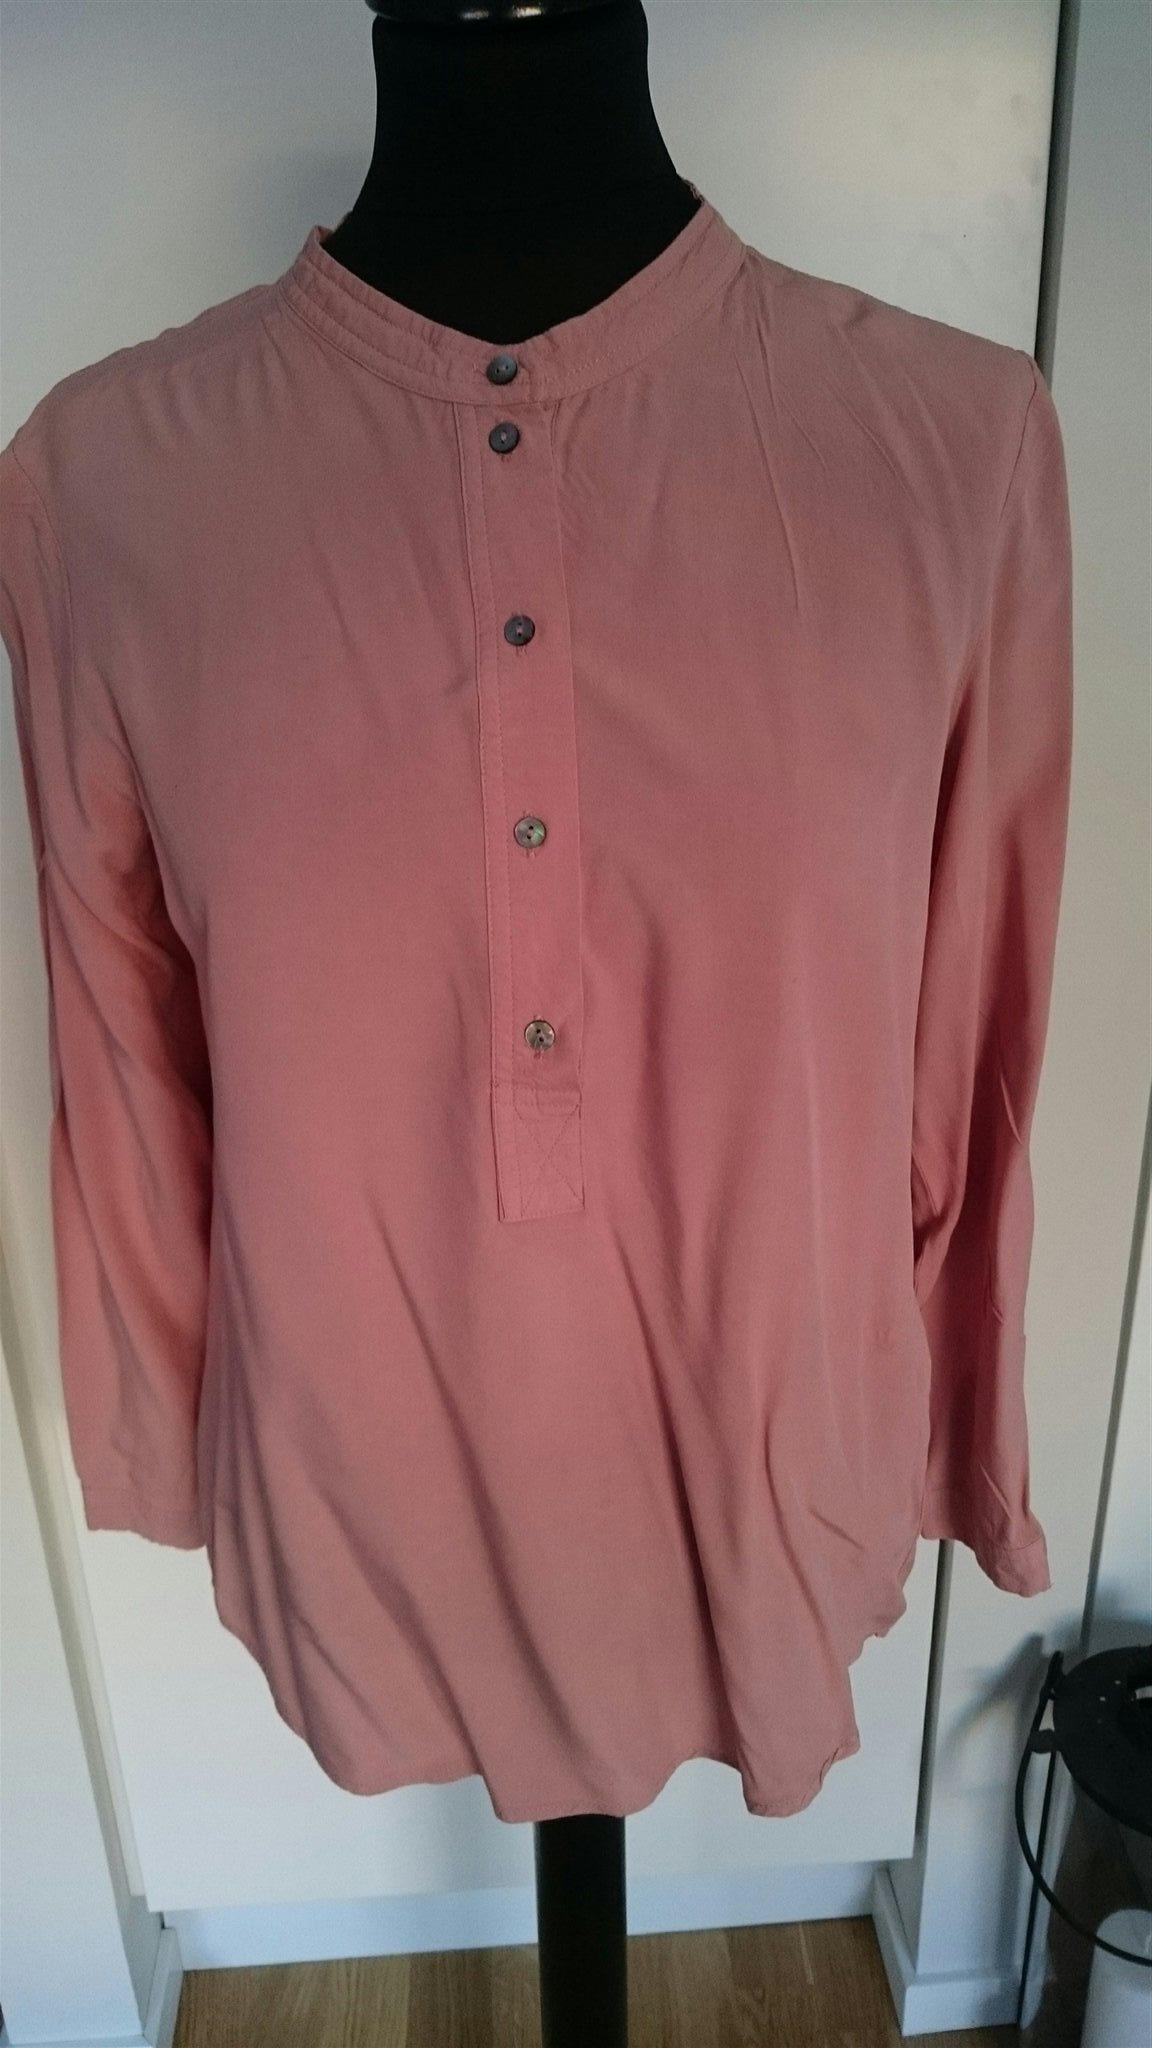 Blus hög krage stl 36 38 only nova tunic tunika dusty pink gammelrosa rosa 13603ae8367d4